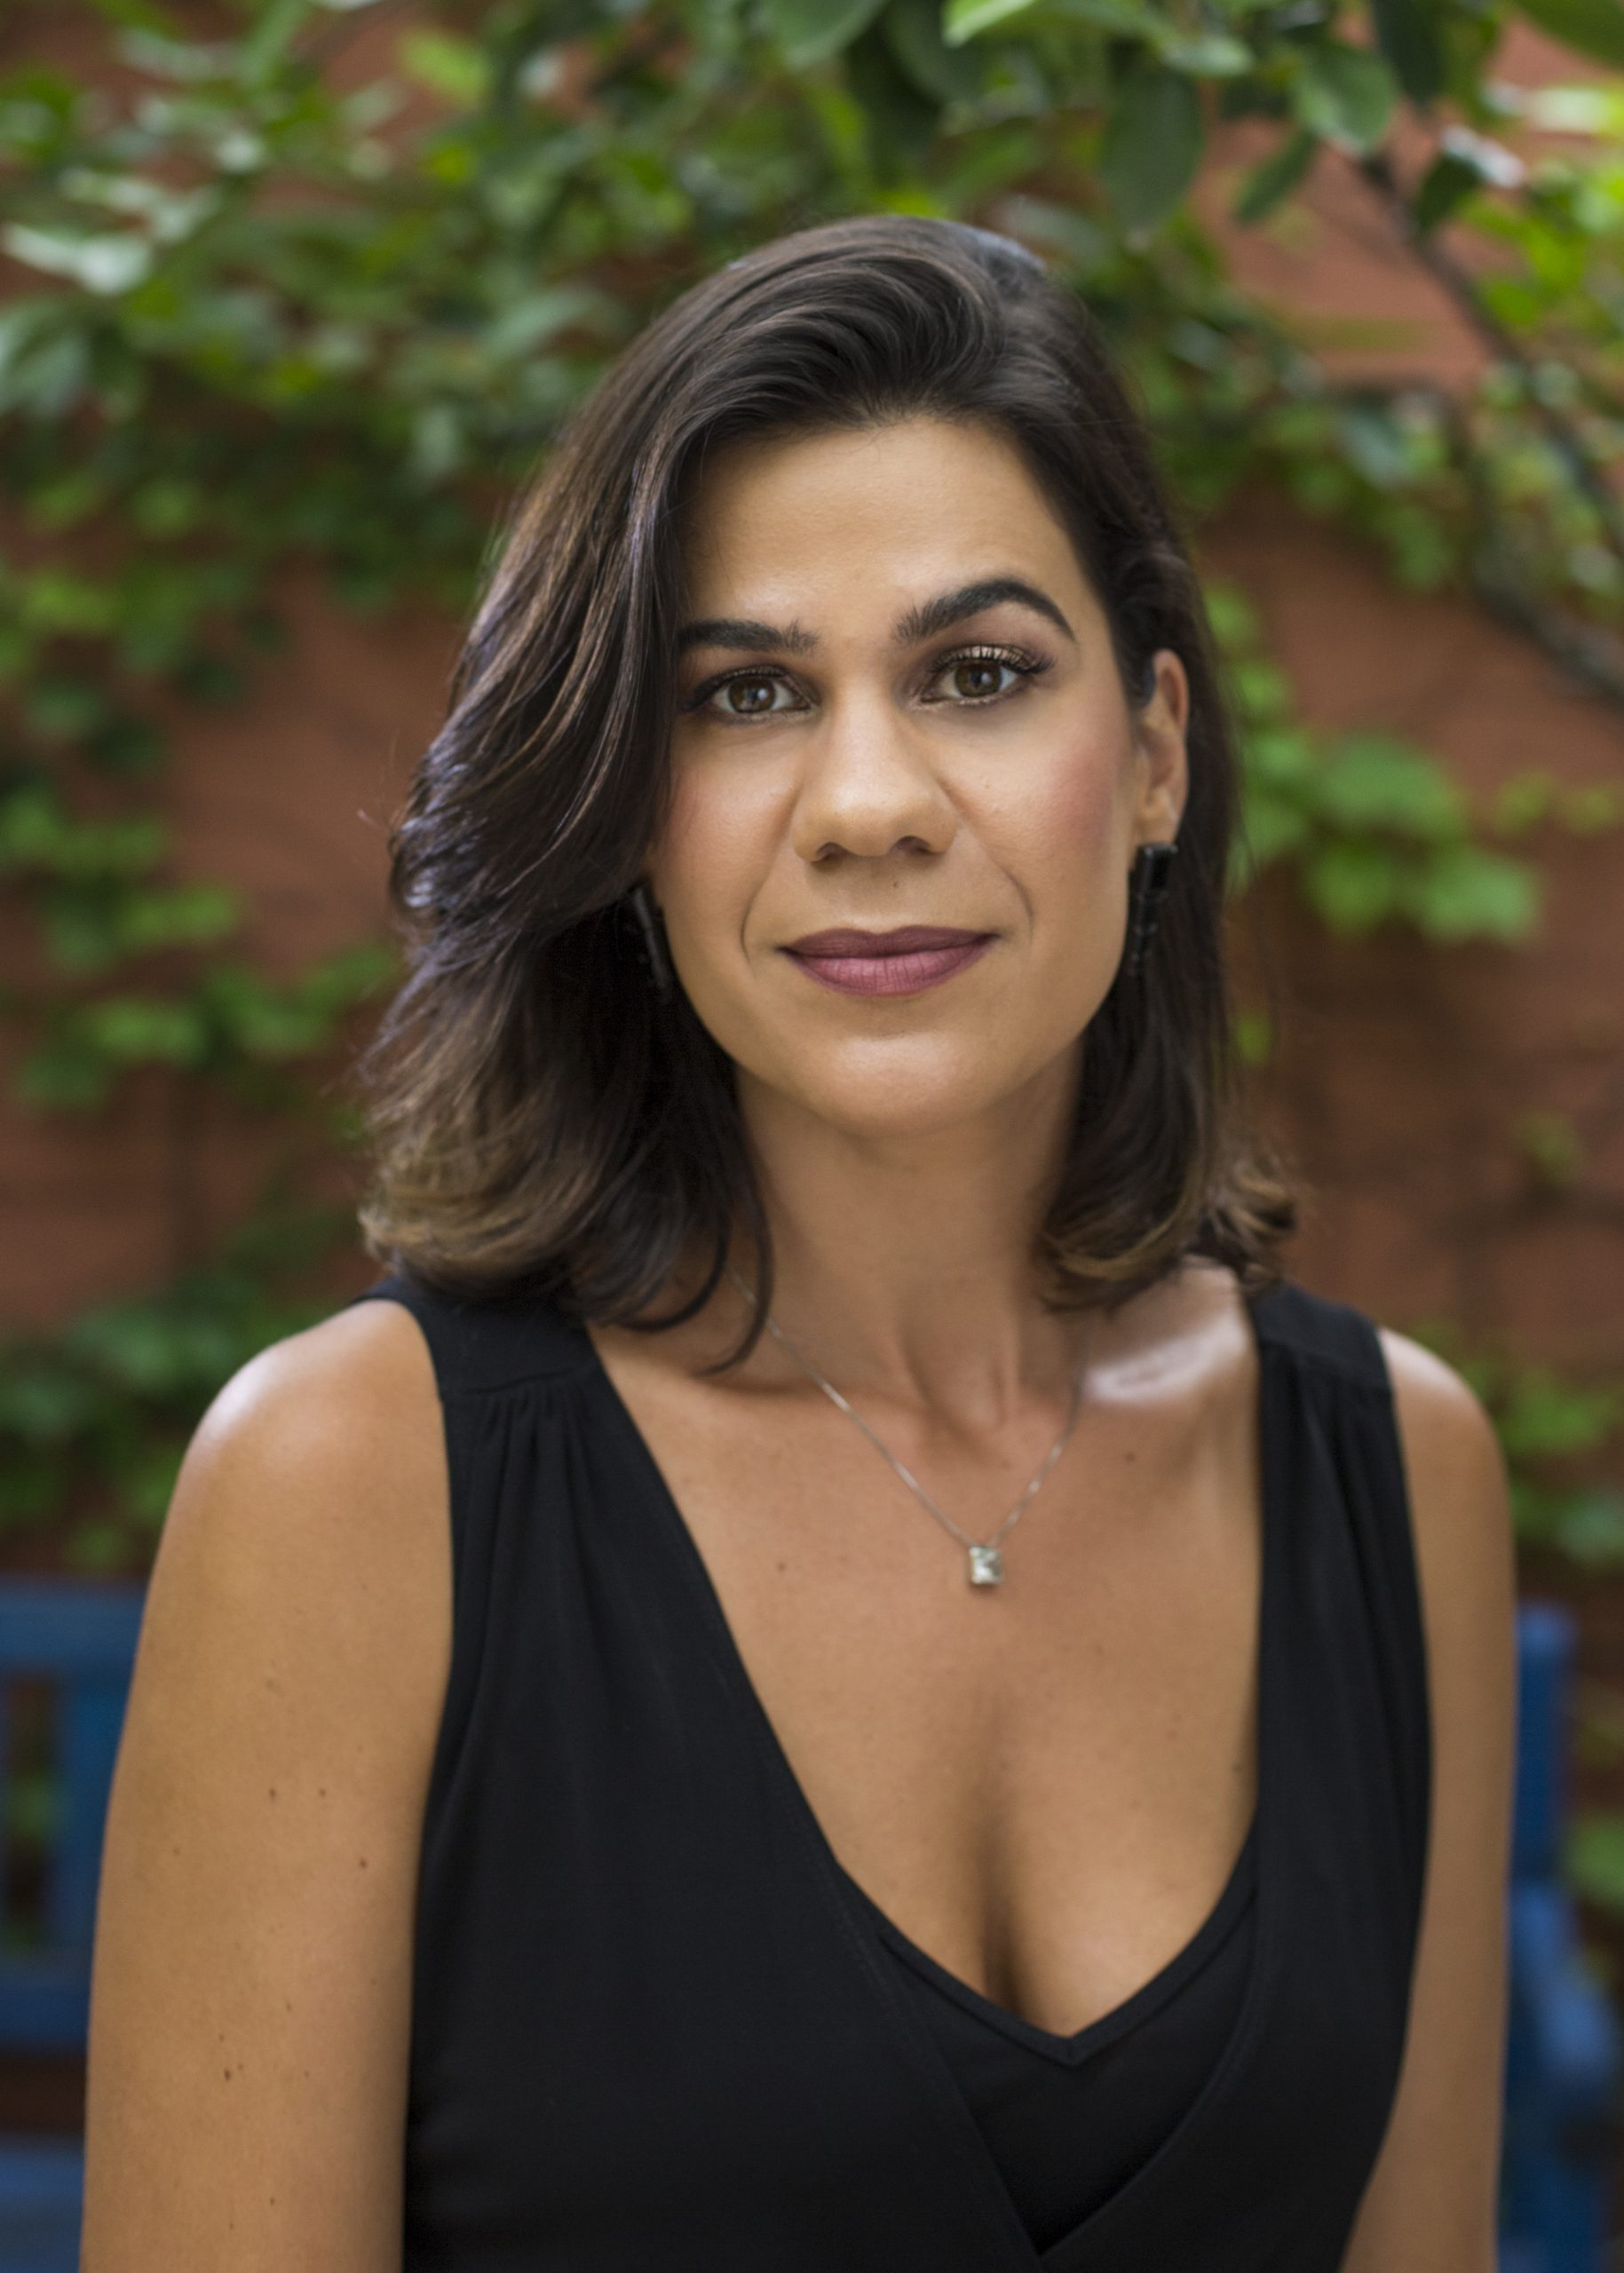 Fabiana Sedola